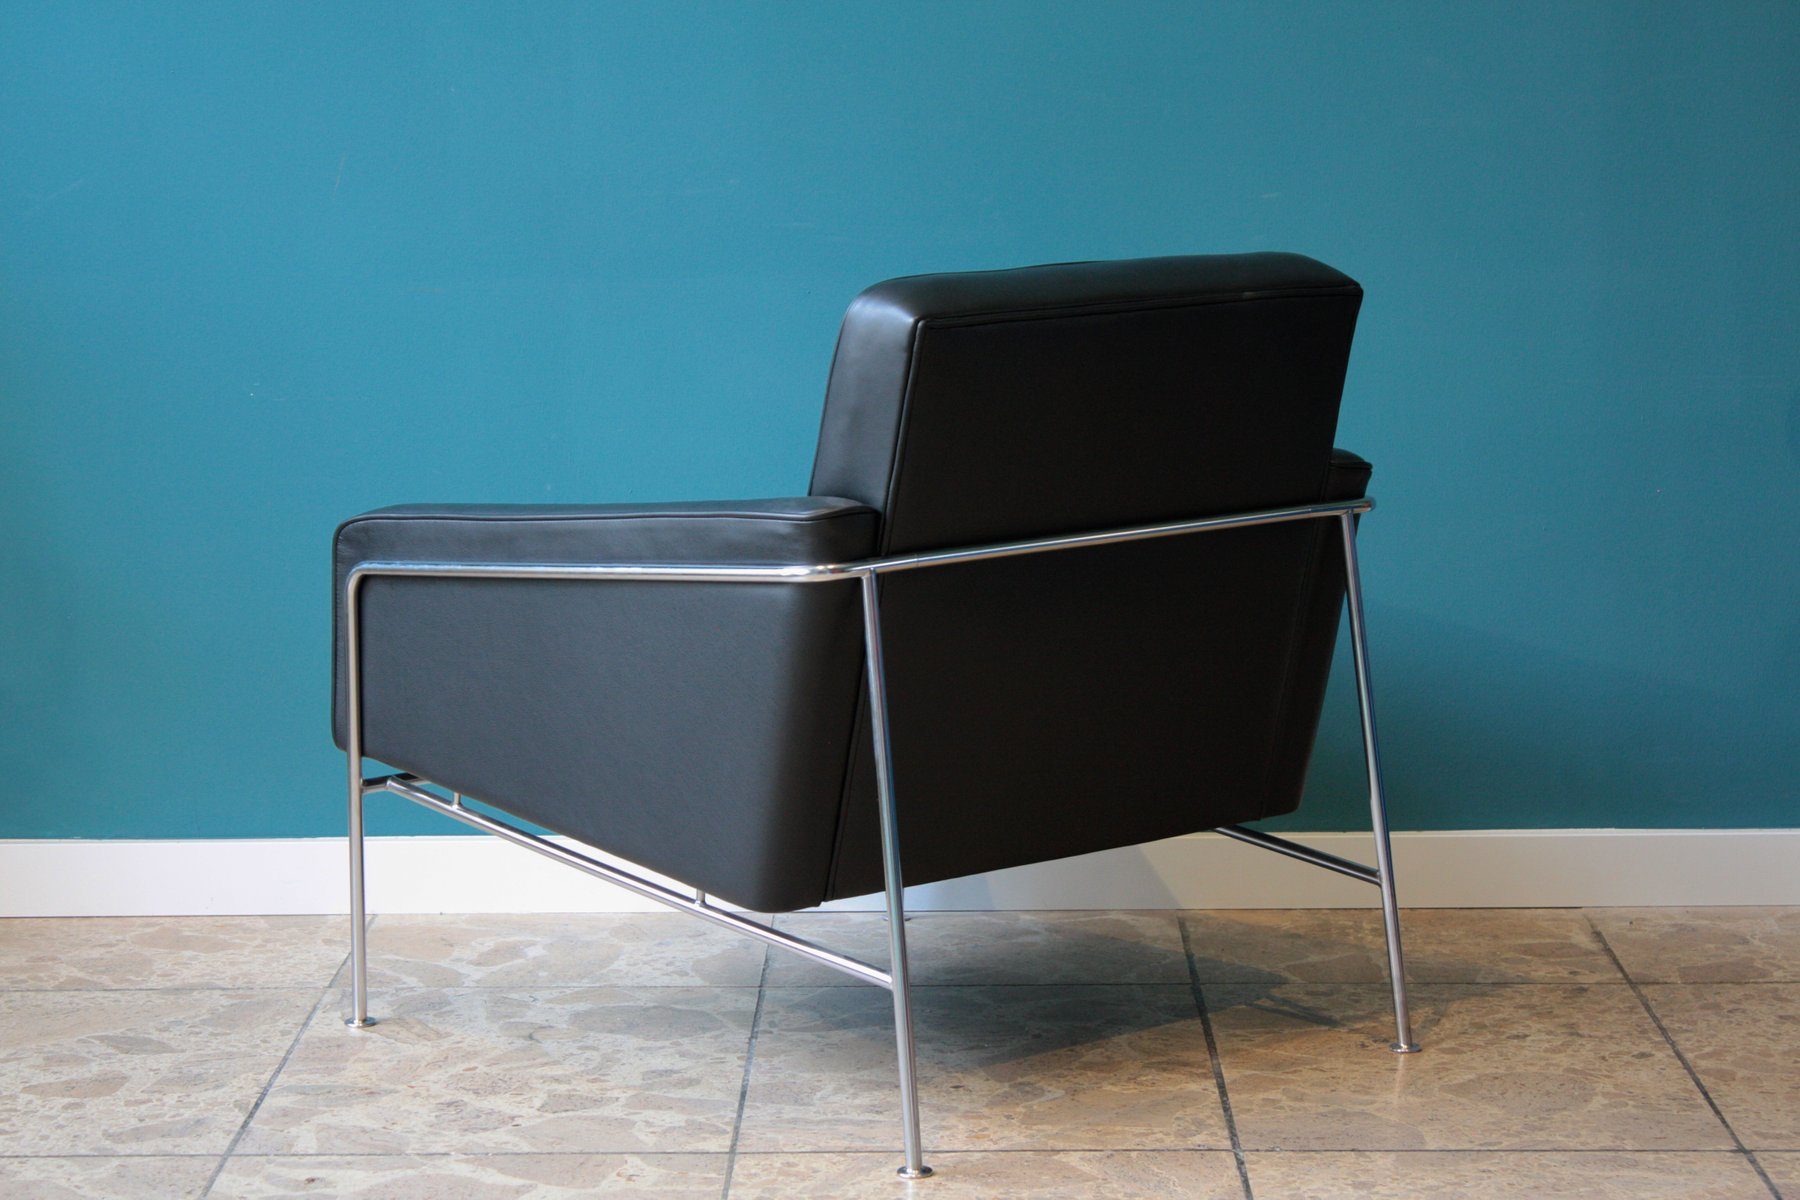 model 3300 lounge chair by arne jacobsen for fritz hansen. Black Bedroom Furniture Sets. Home Design Ideas